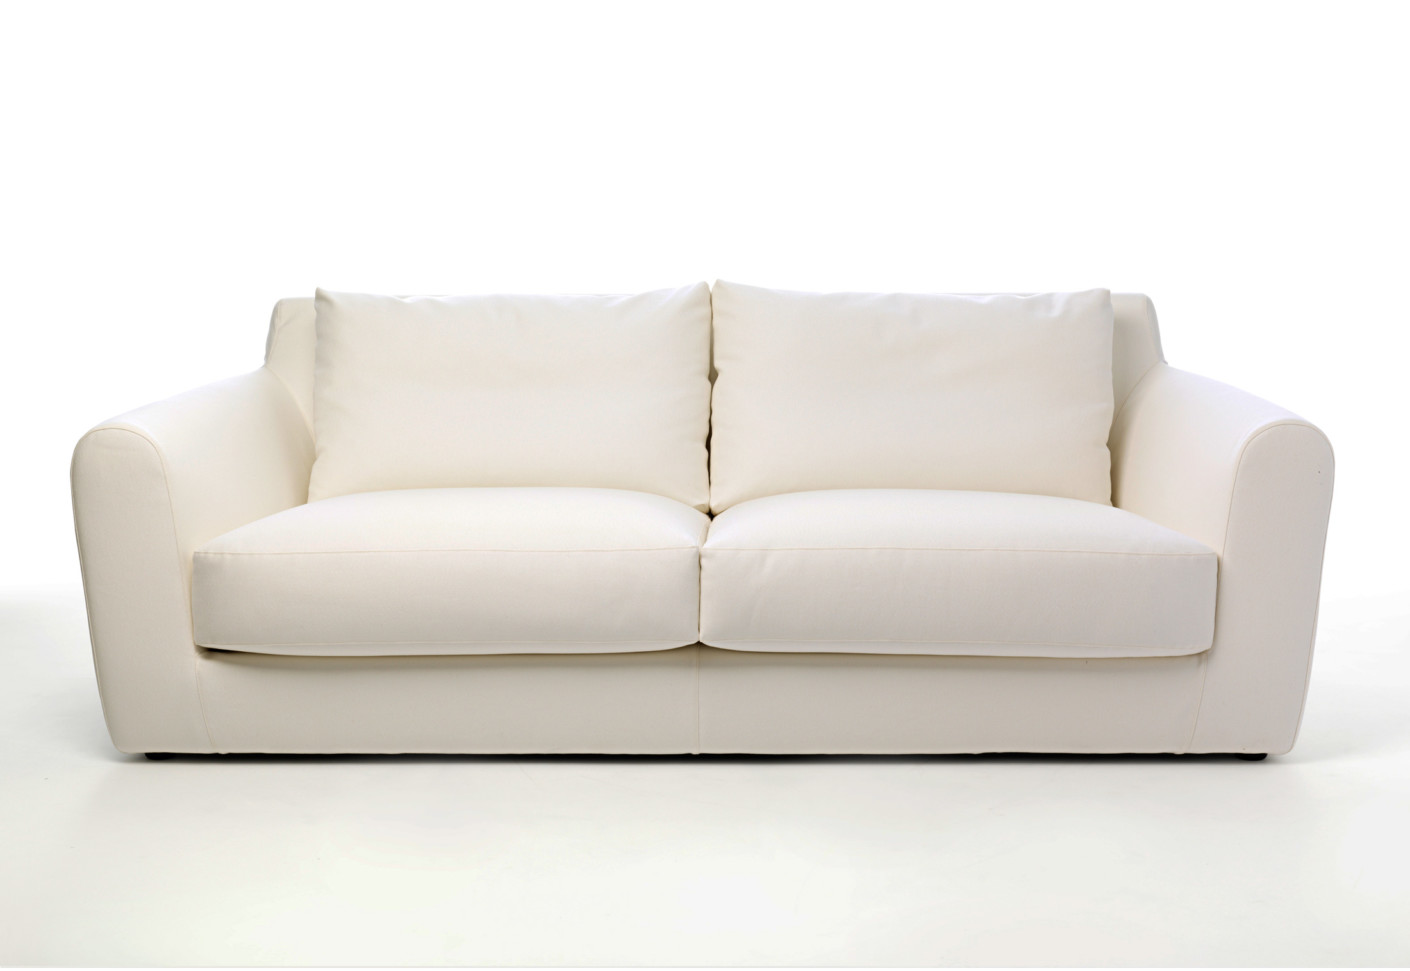 sofa bed big c bestseller shop f r m bel und einrichtungen. Black Bedroom Furniture Sets. Home Design Ideas